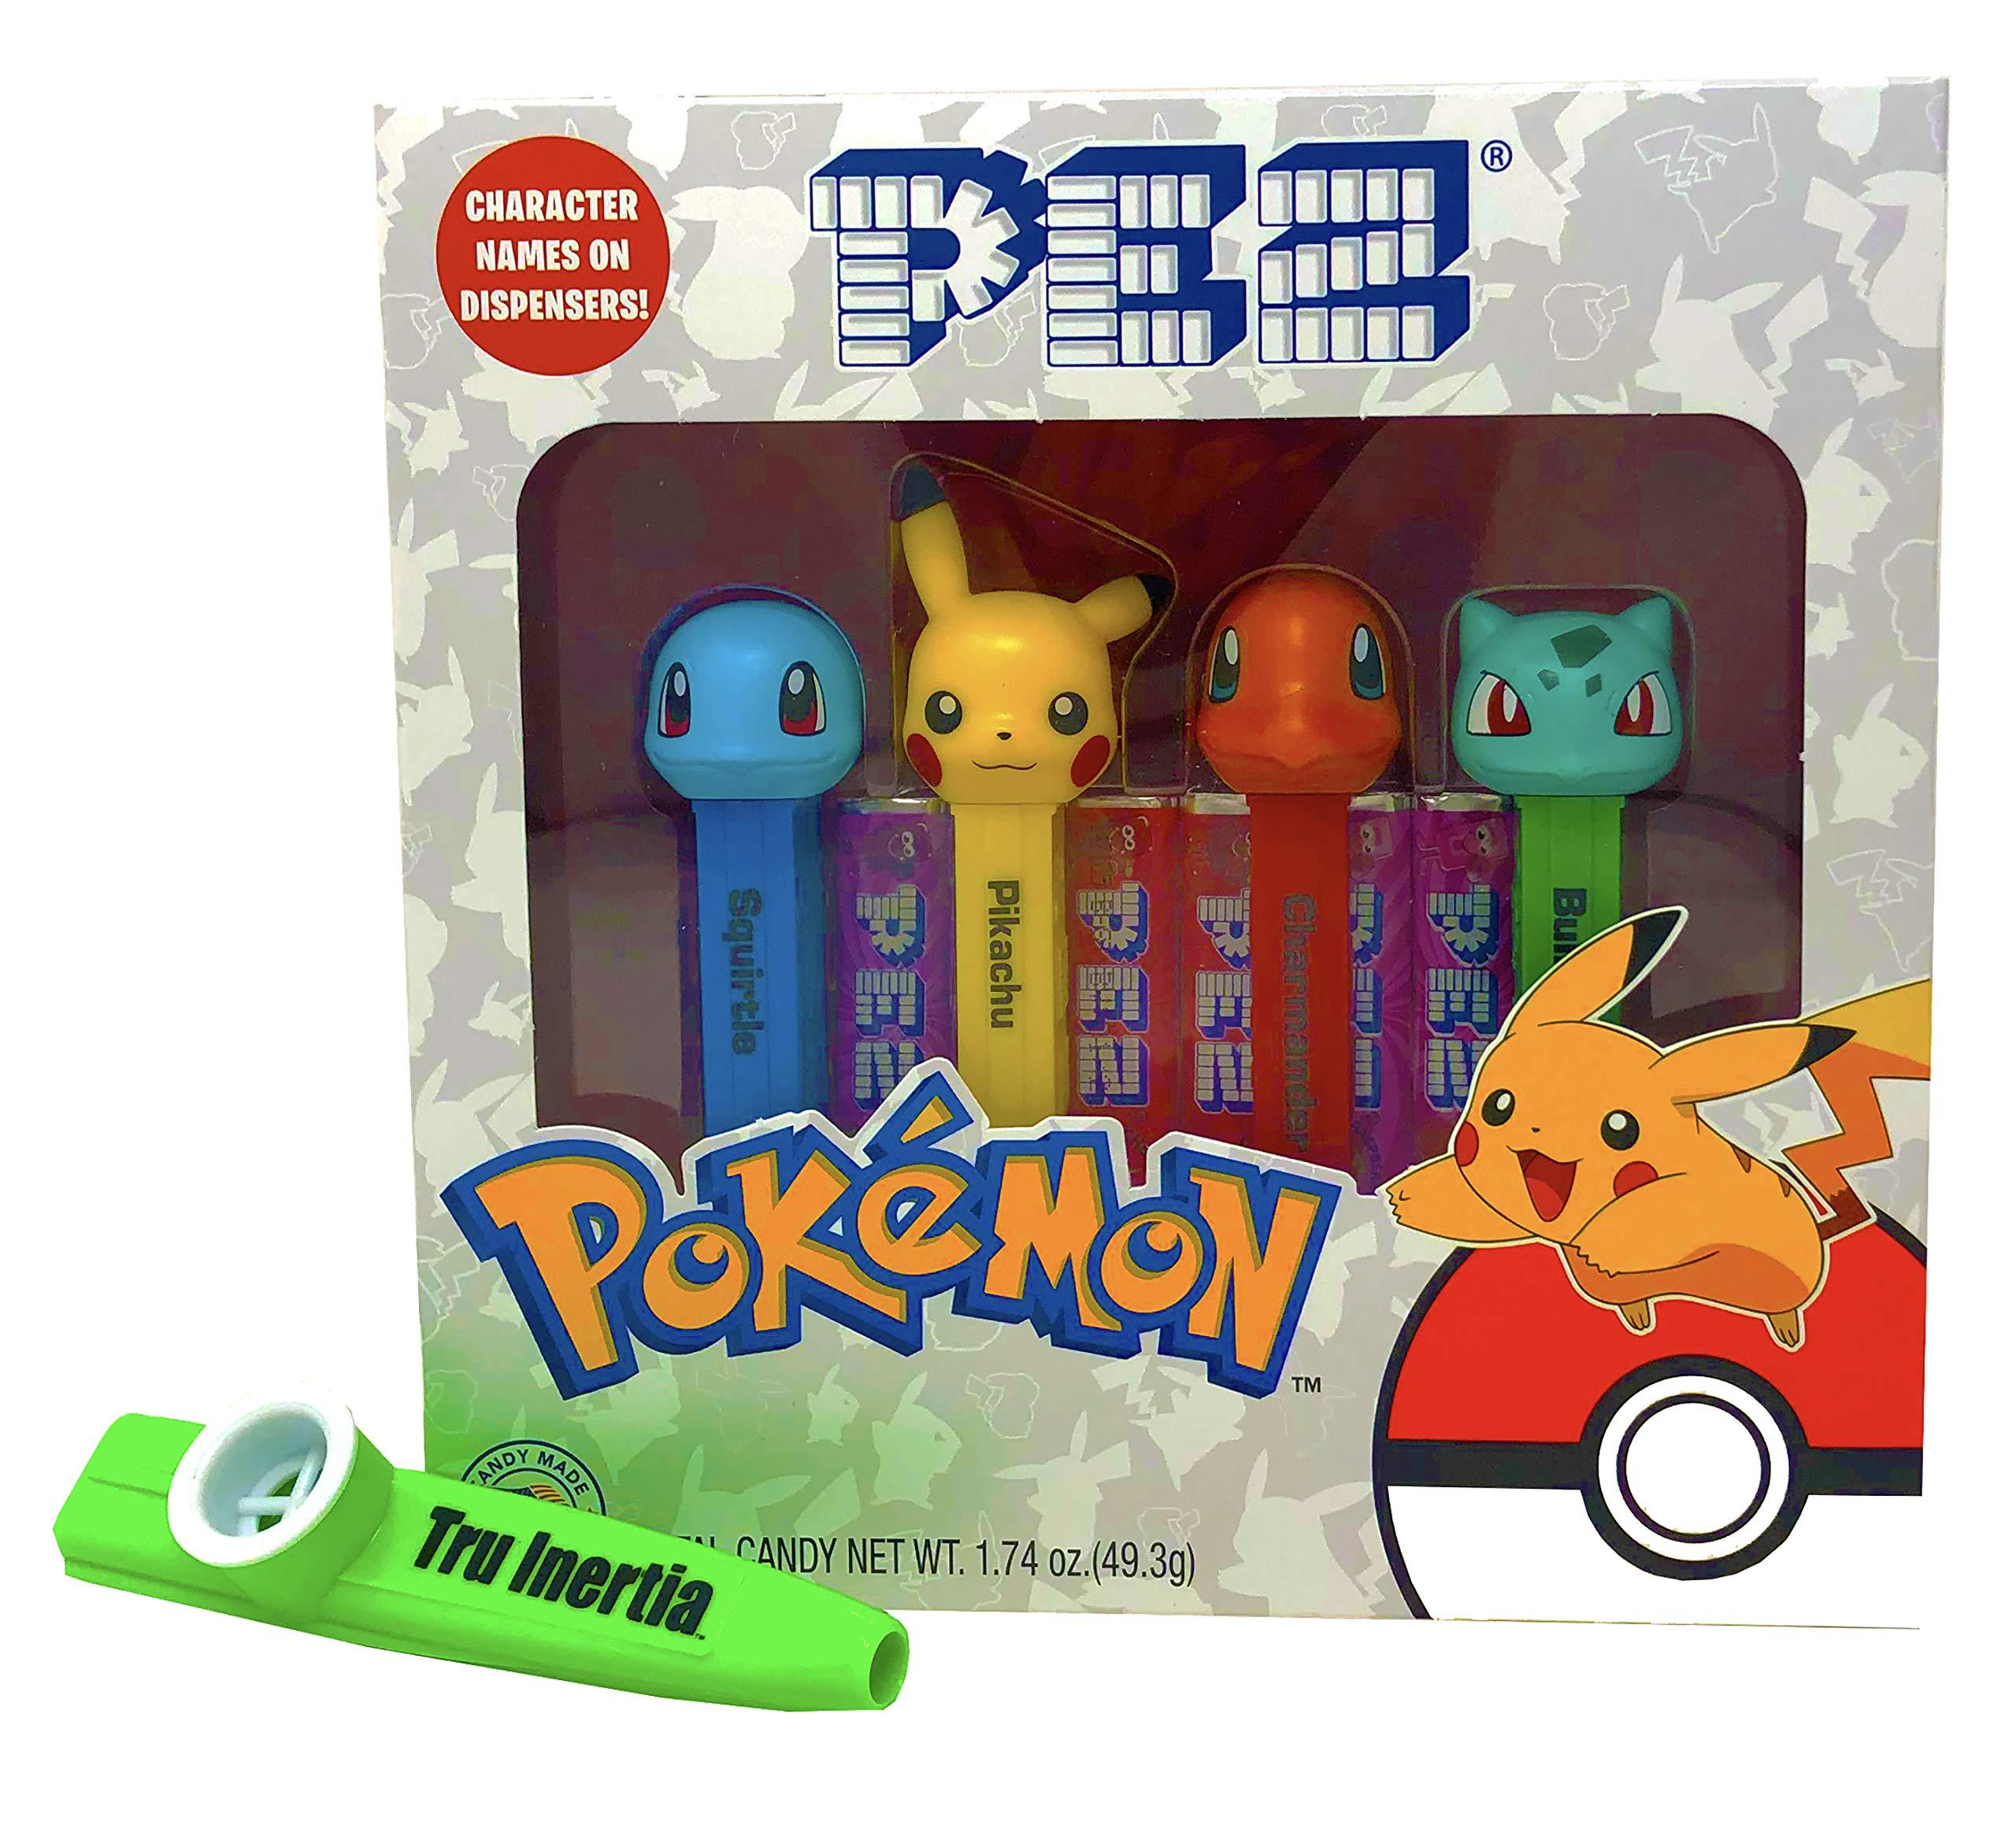 Pez Pokemon Candy and Dispensers Gift Set with Tru Inertia Kazoo - Pikachu, Charmander, Bulbasaur, Squirtle by Tru Inertia